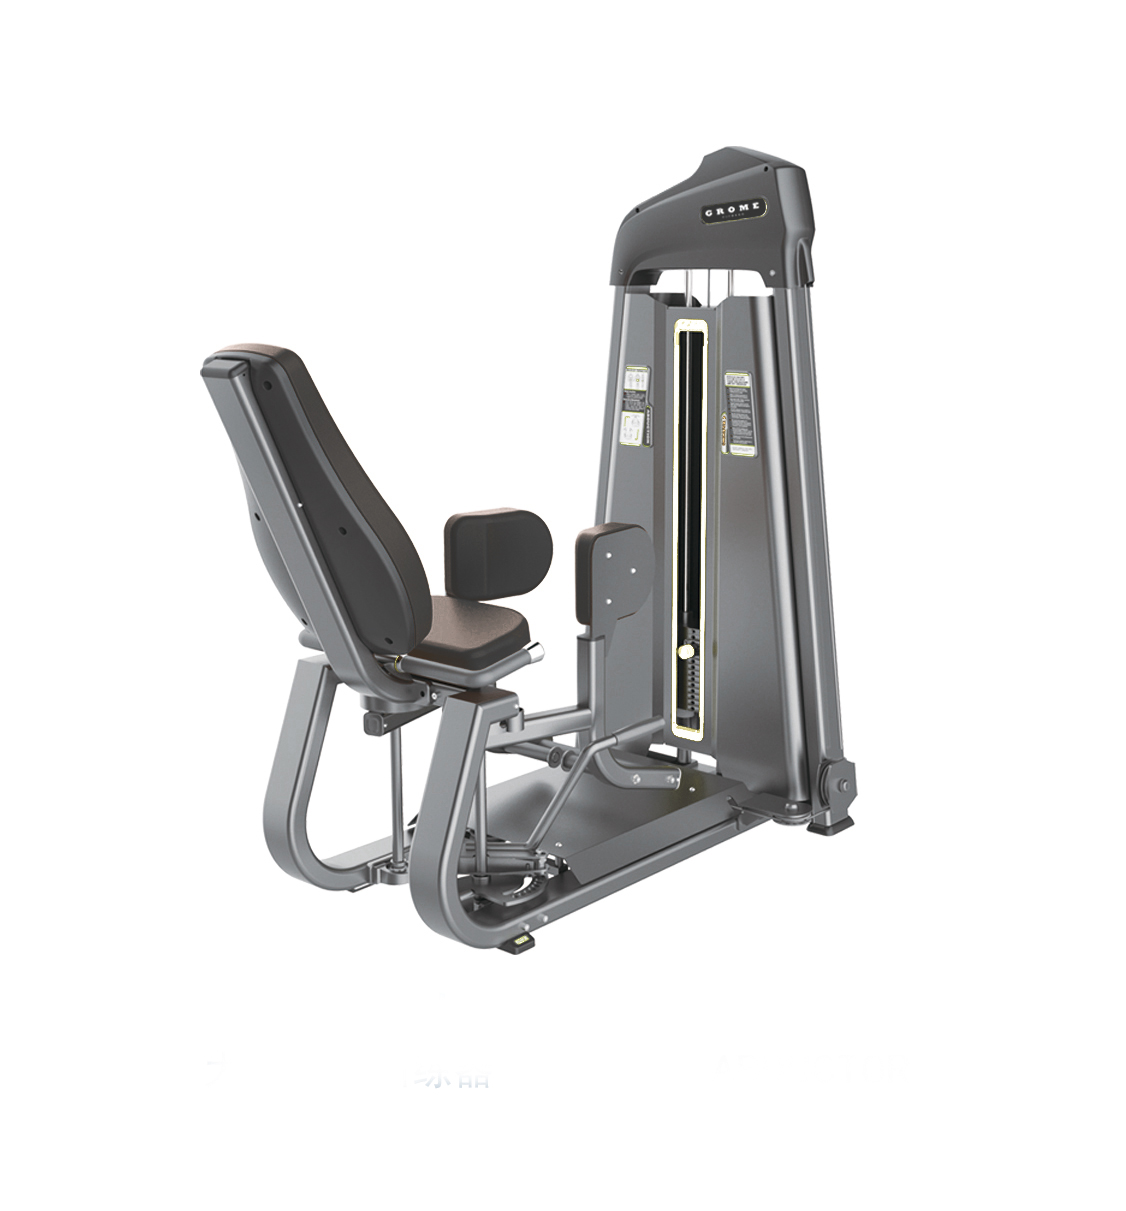 Тренажер GROME Fitness AXD5021A Разведение ног